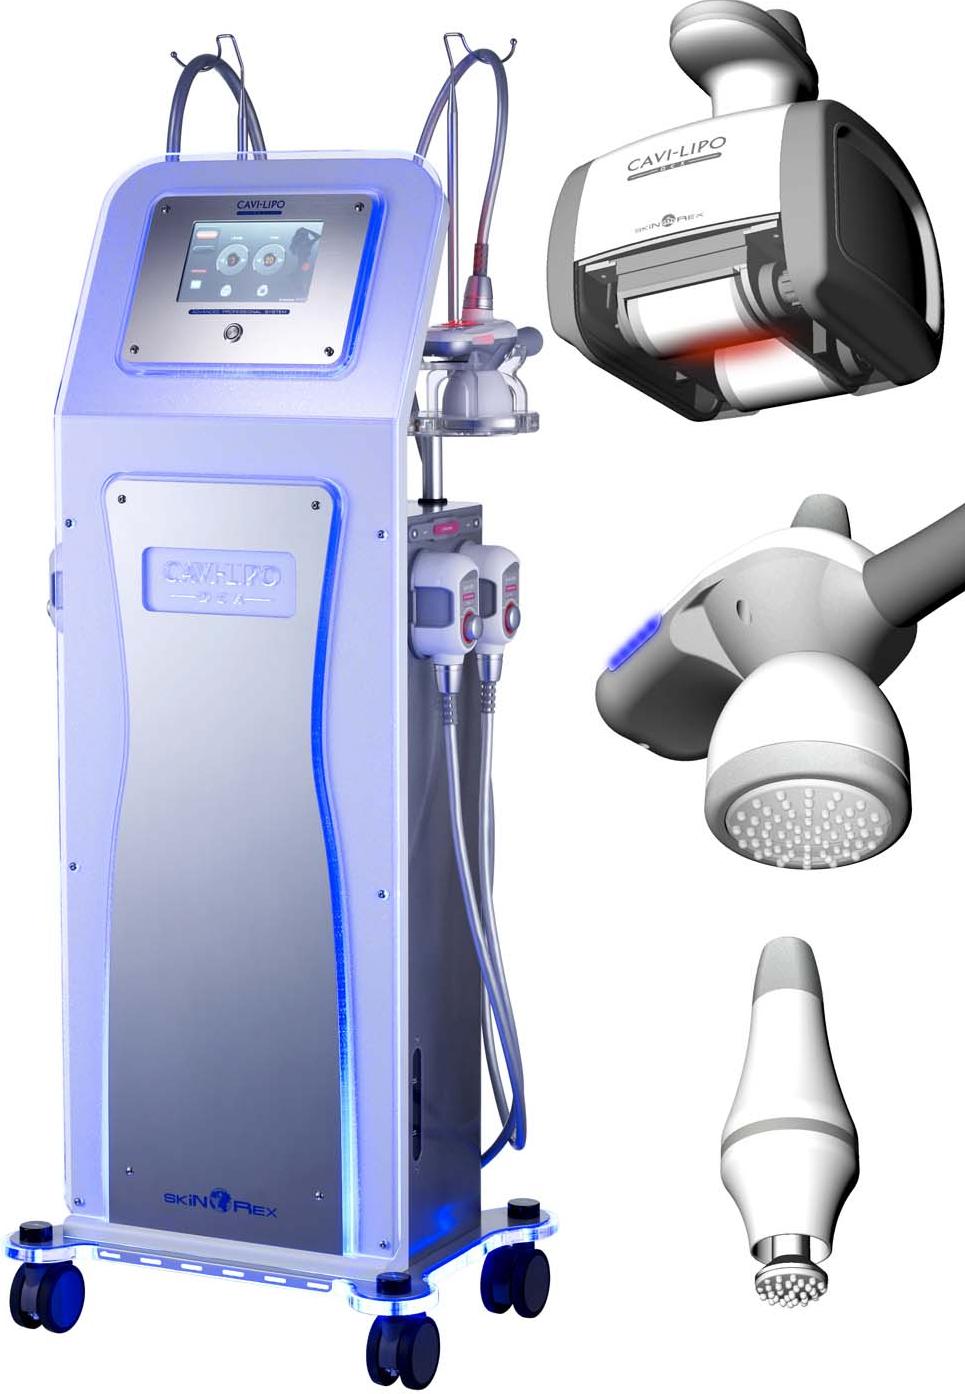 پیشرفته ترین دستگاههای لاغری (کرایولیپولیز کویتیشن رادیوفرکونسی ال پی جی لیزردرمانی کم توان